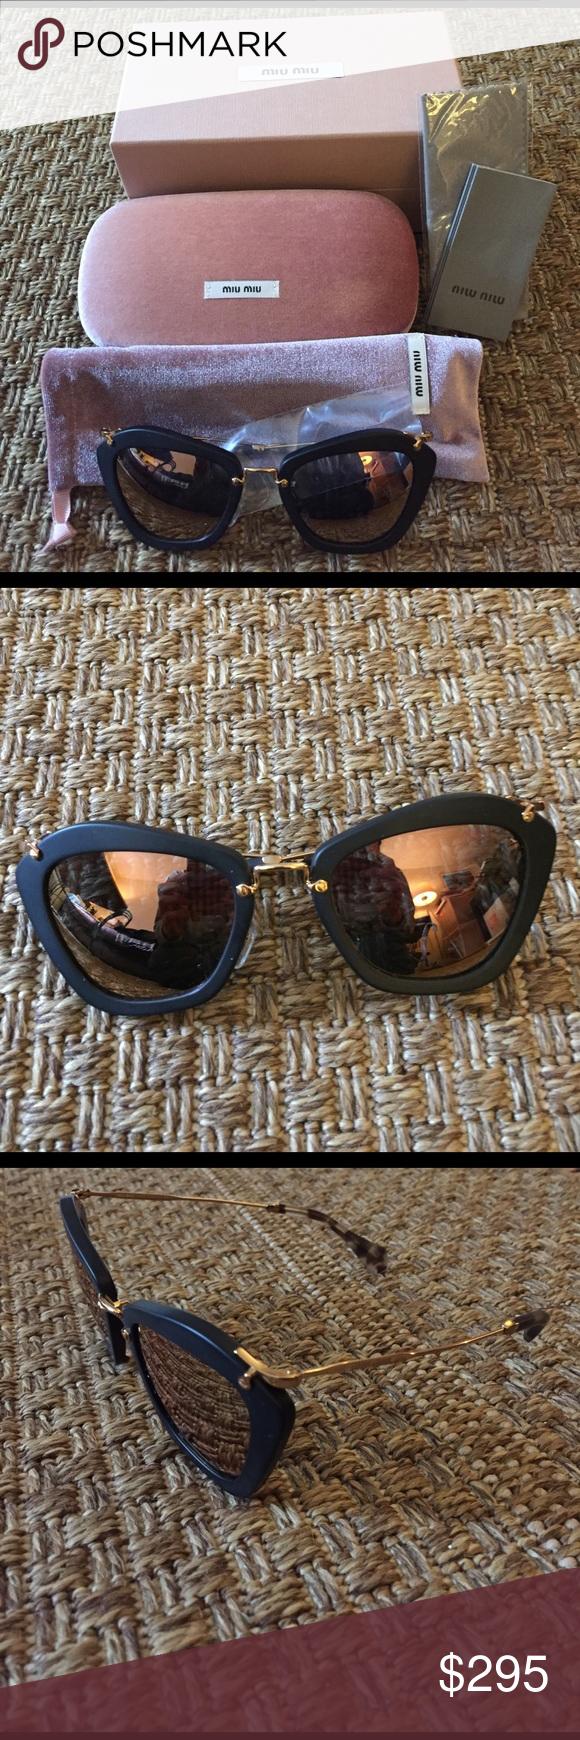 4568f76bd5d NEW Miu Miu cat eye sunglasses Brand new never been worn Miu Miu cat eye  sunglasses with rose gold mirror lenses. Best selling Miu Miu style (0MU  10NS) ...